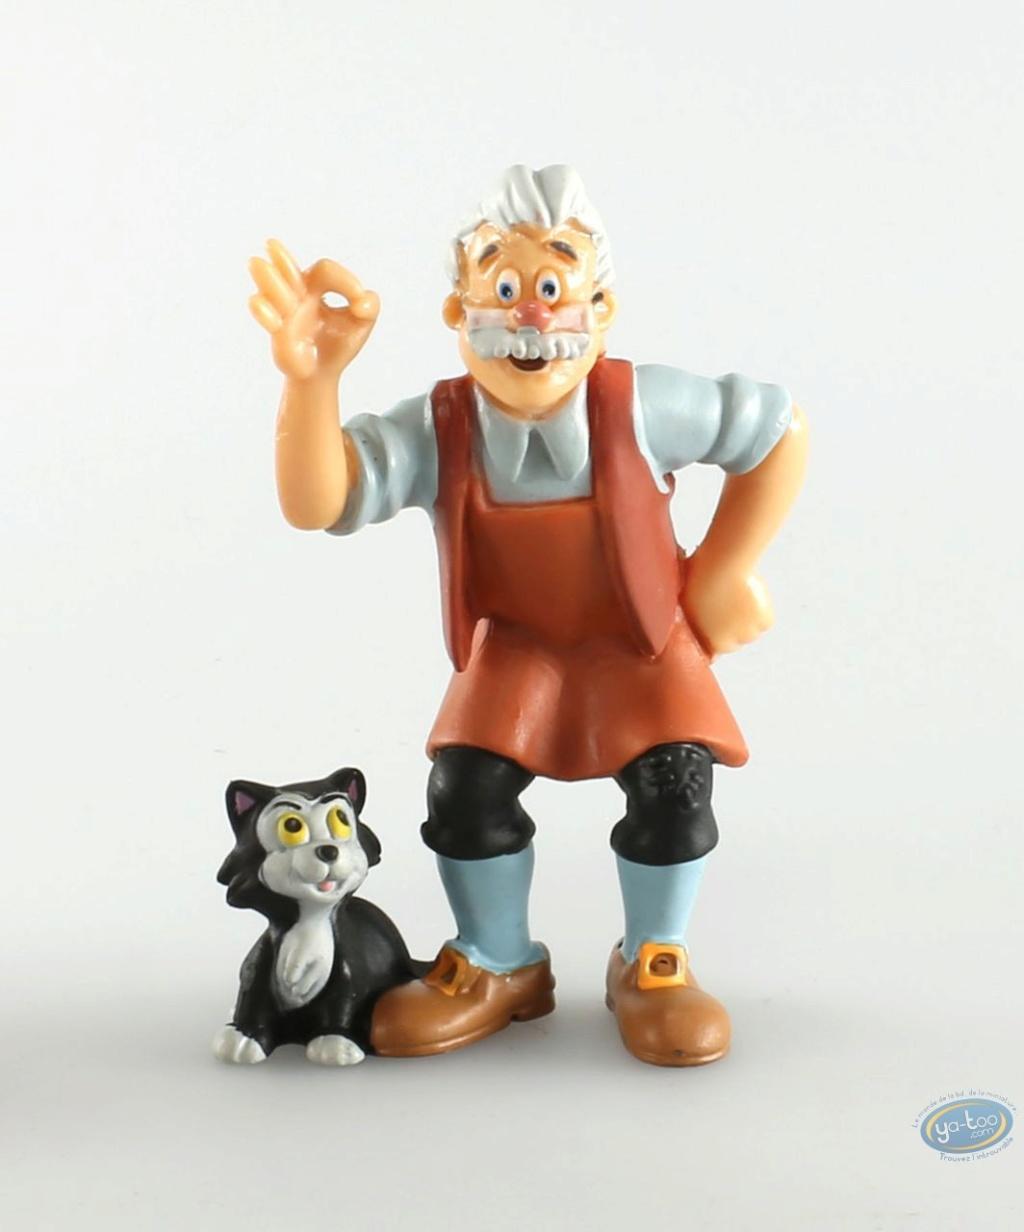 [Collection Press] N° 1 Walt Disney figurines de collection - Hachette - 01/2017 - Page 33 Bul-fi10